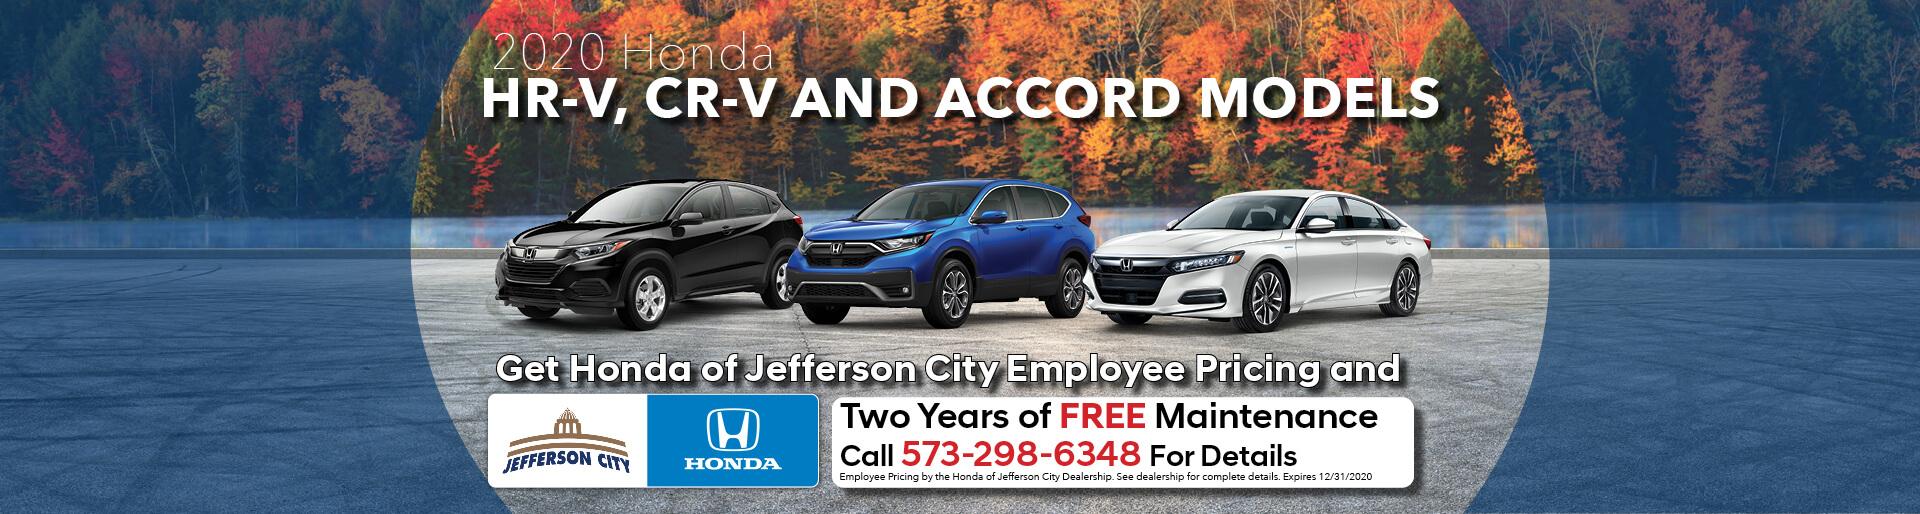 Get employee pricing on 2020 Honda HR-V, CR-V, & Accord Models | Jefferson City, MO